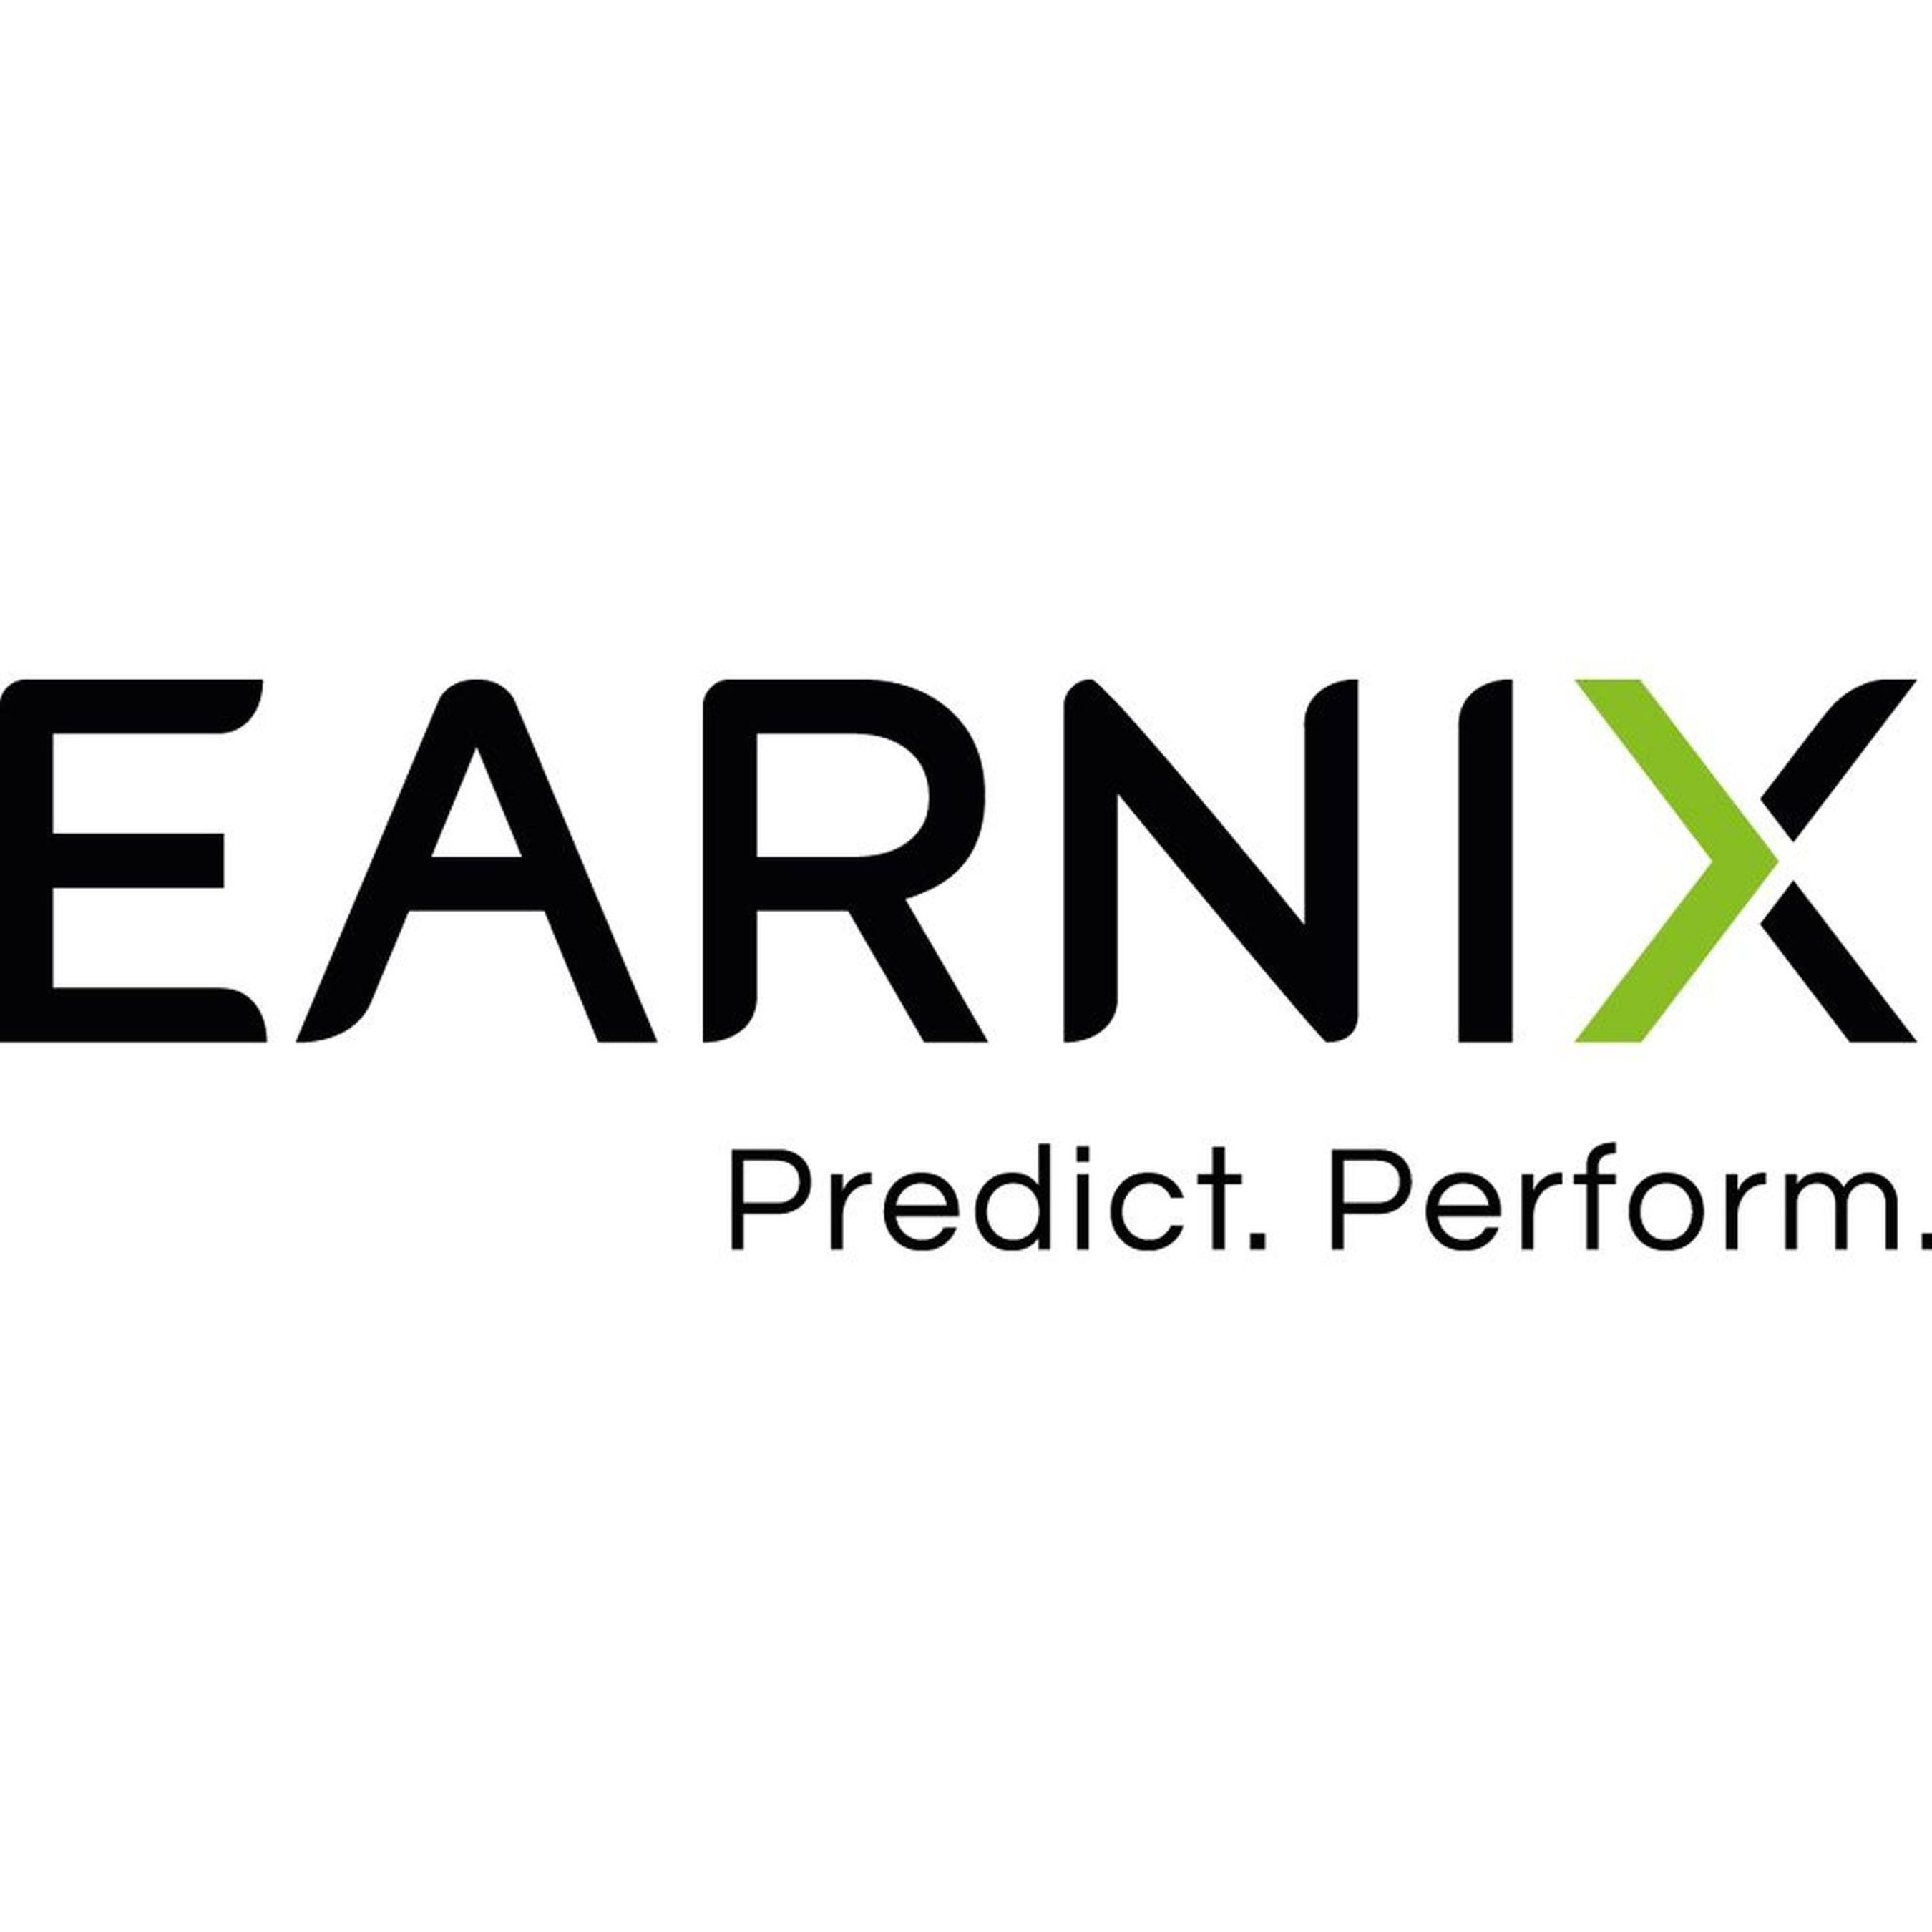 Earnix Strengthens its Management Team